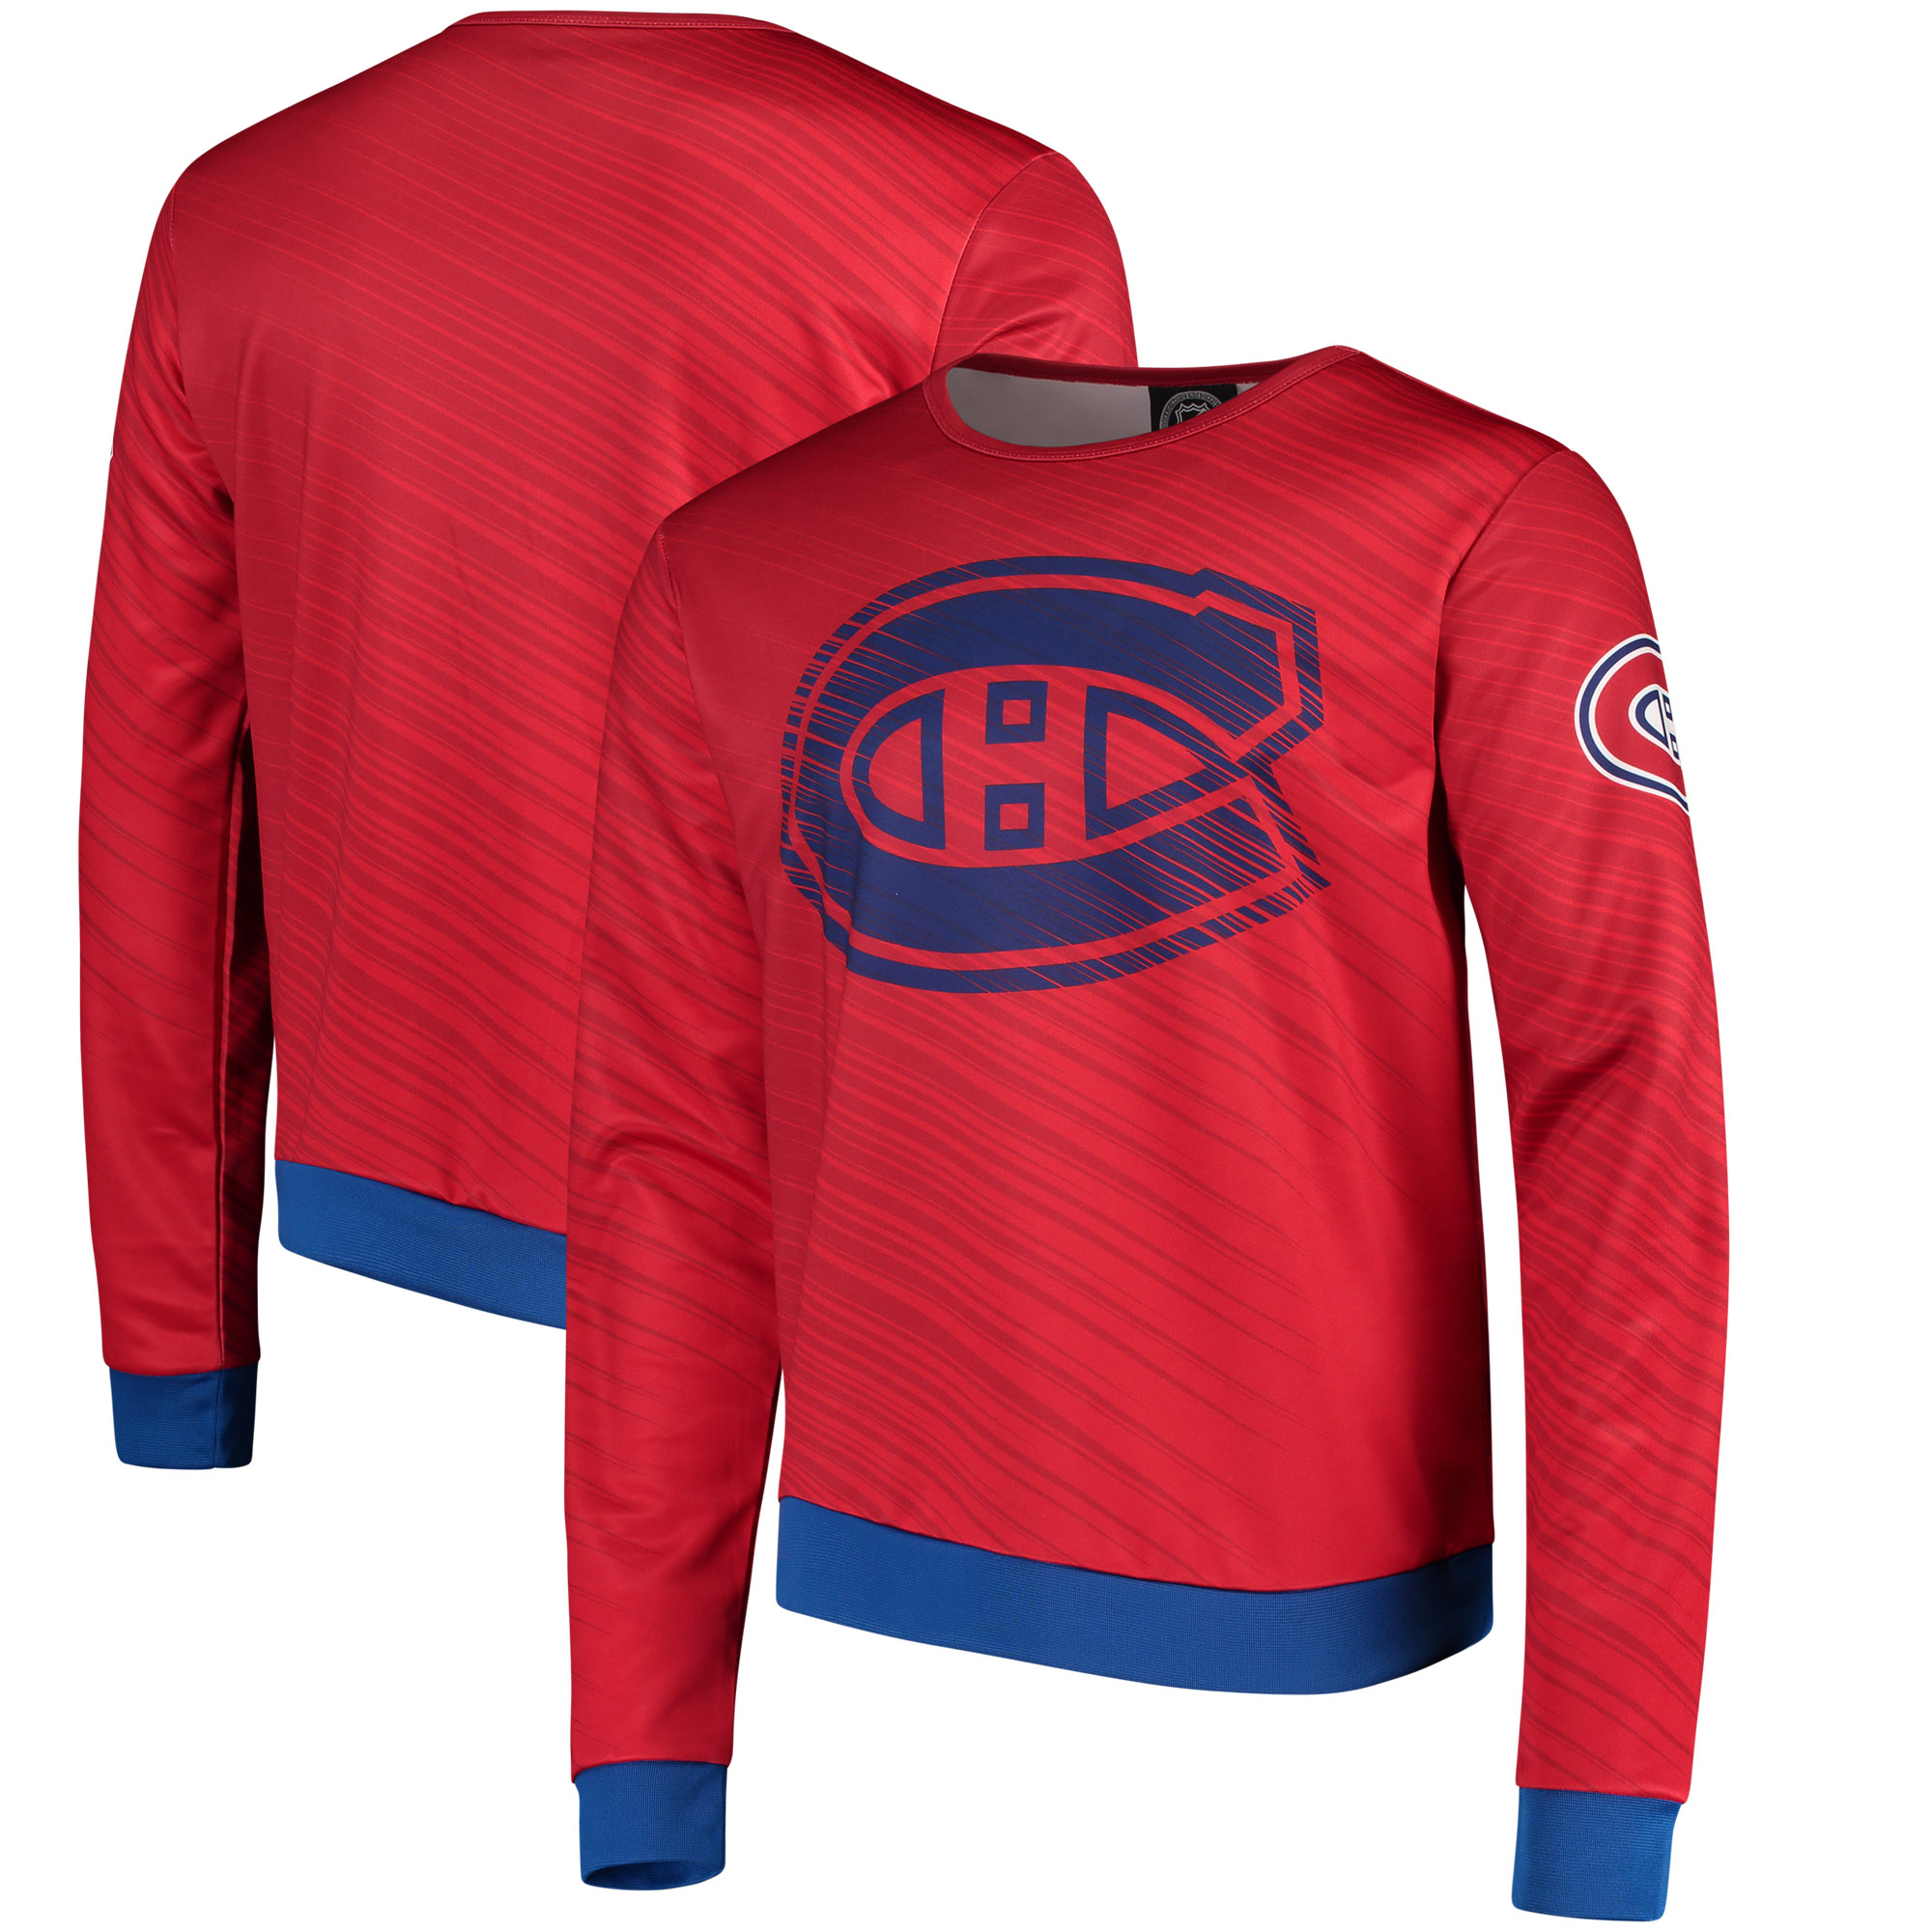 Montreal Canadiens Static Rain Printed Sweatshirt - Red